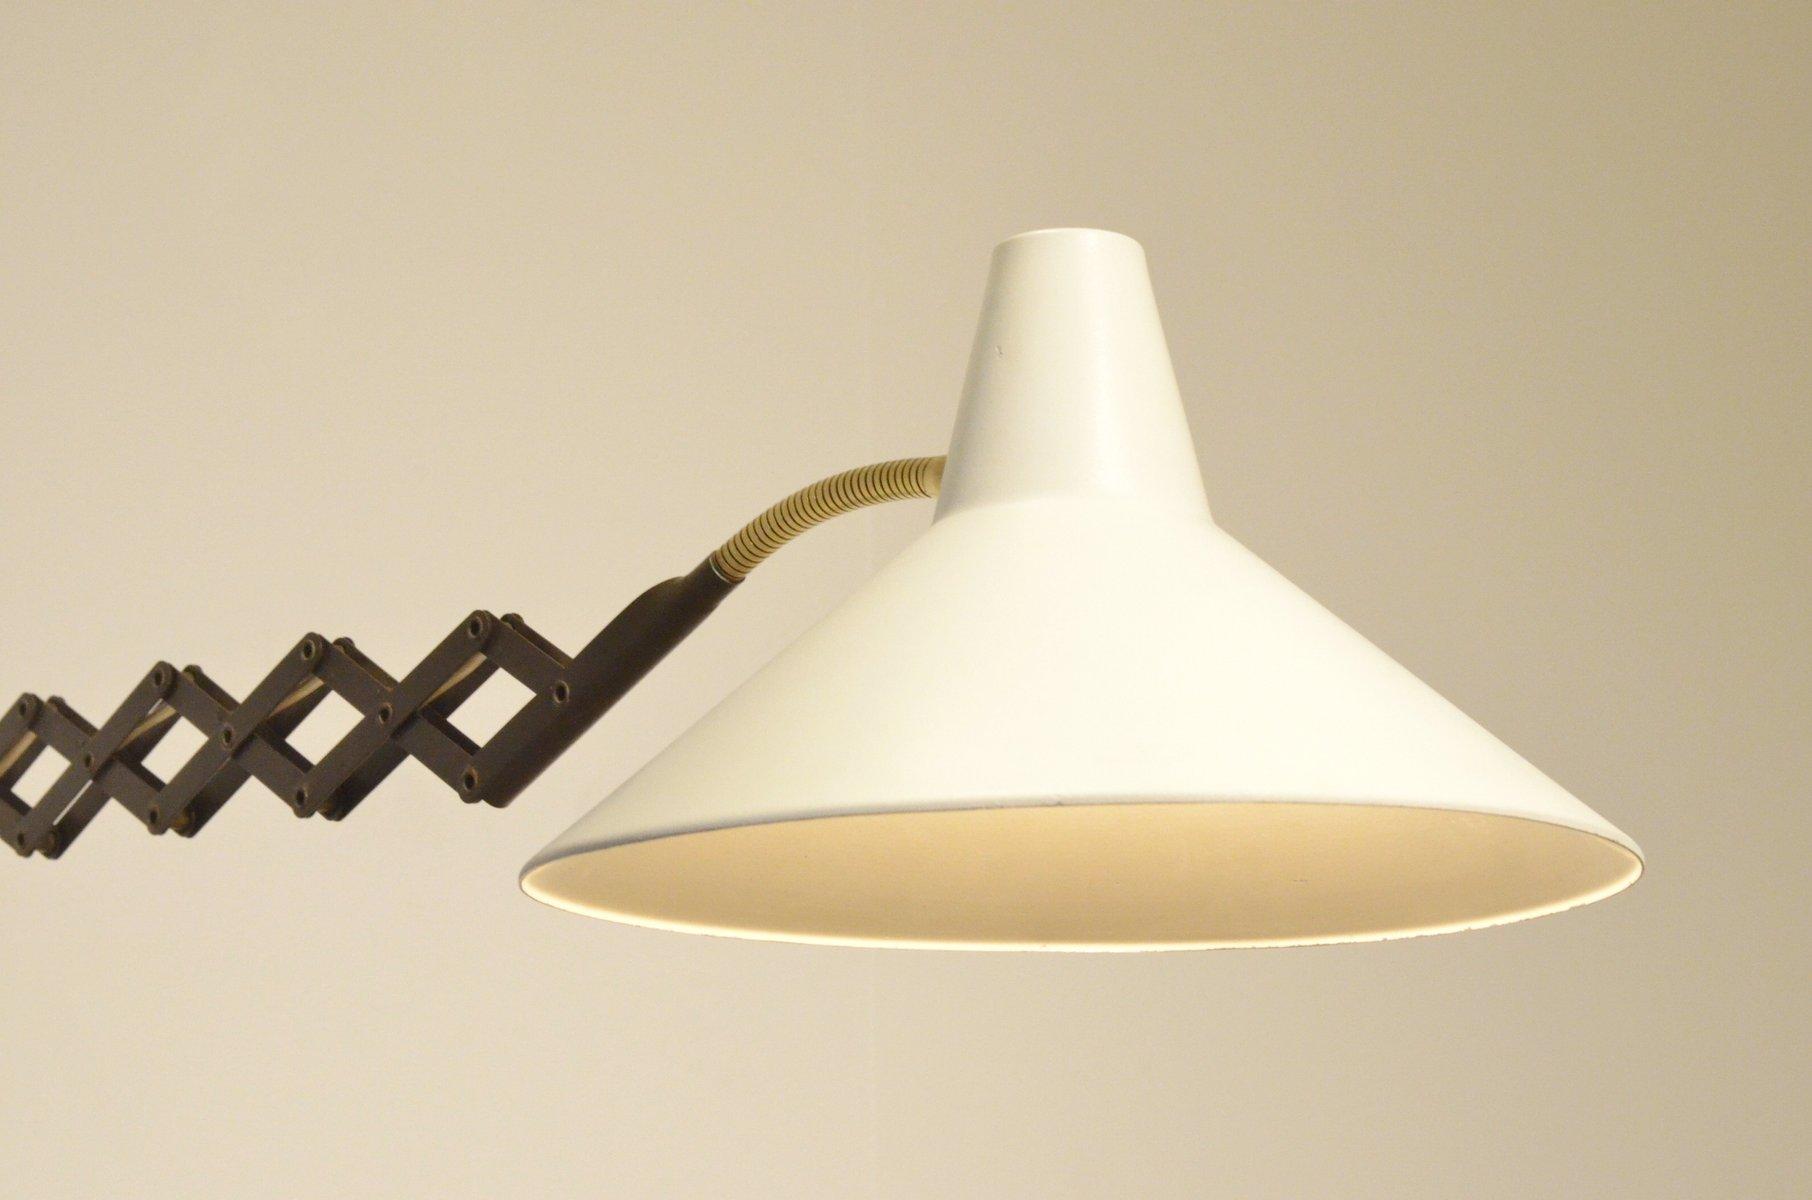 design lampe ziehharmonika. Black Bedroom Furniture Sets. Home Design Ideas